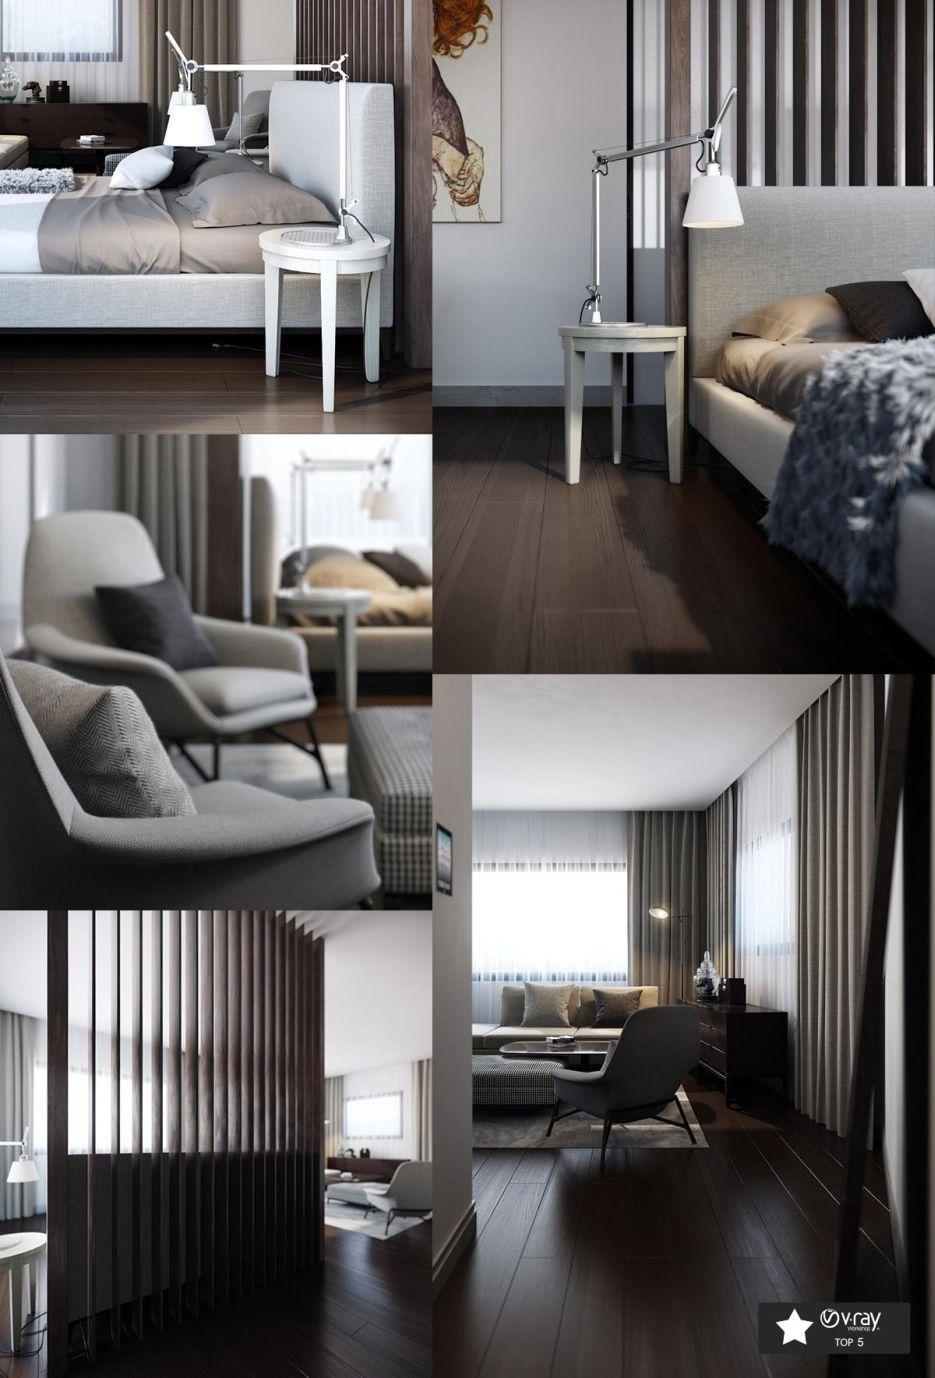 3d Room Interior Design: Interior Design, Interior